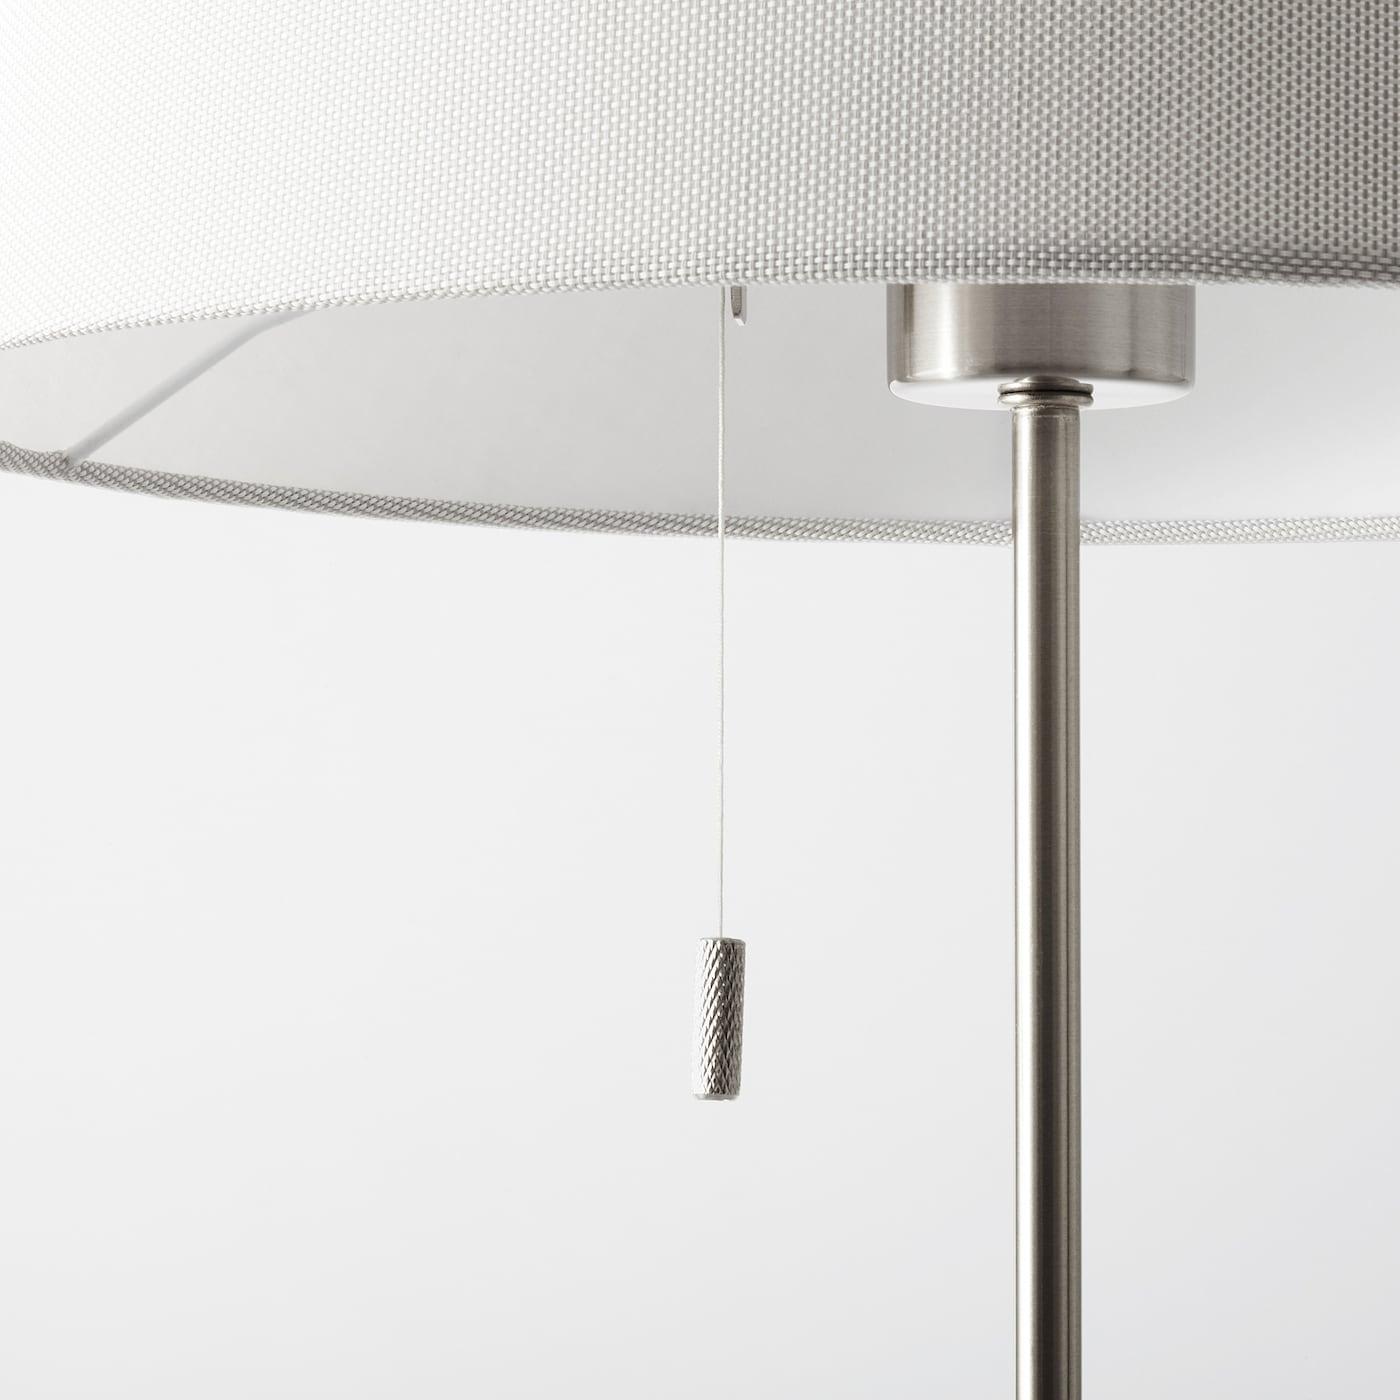 Nyfors Standleuchte Vernickelt Weiss Ikea Deutschland